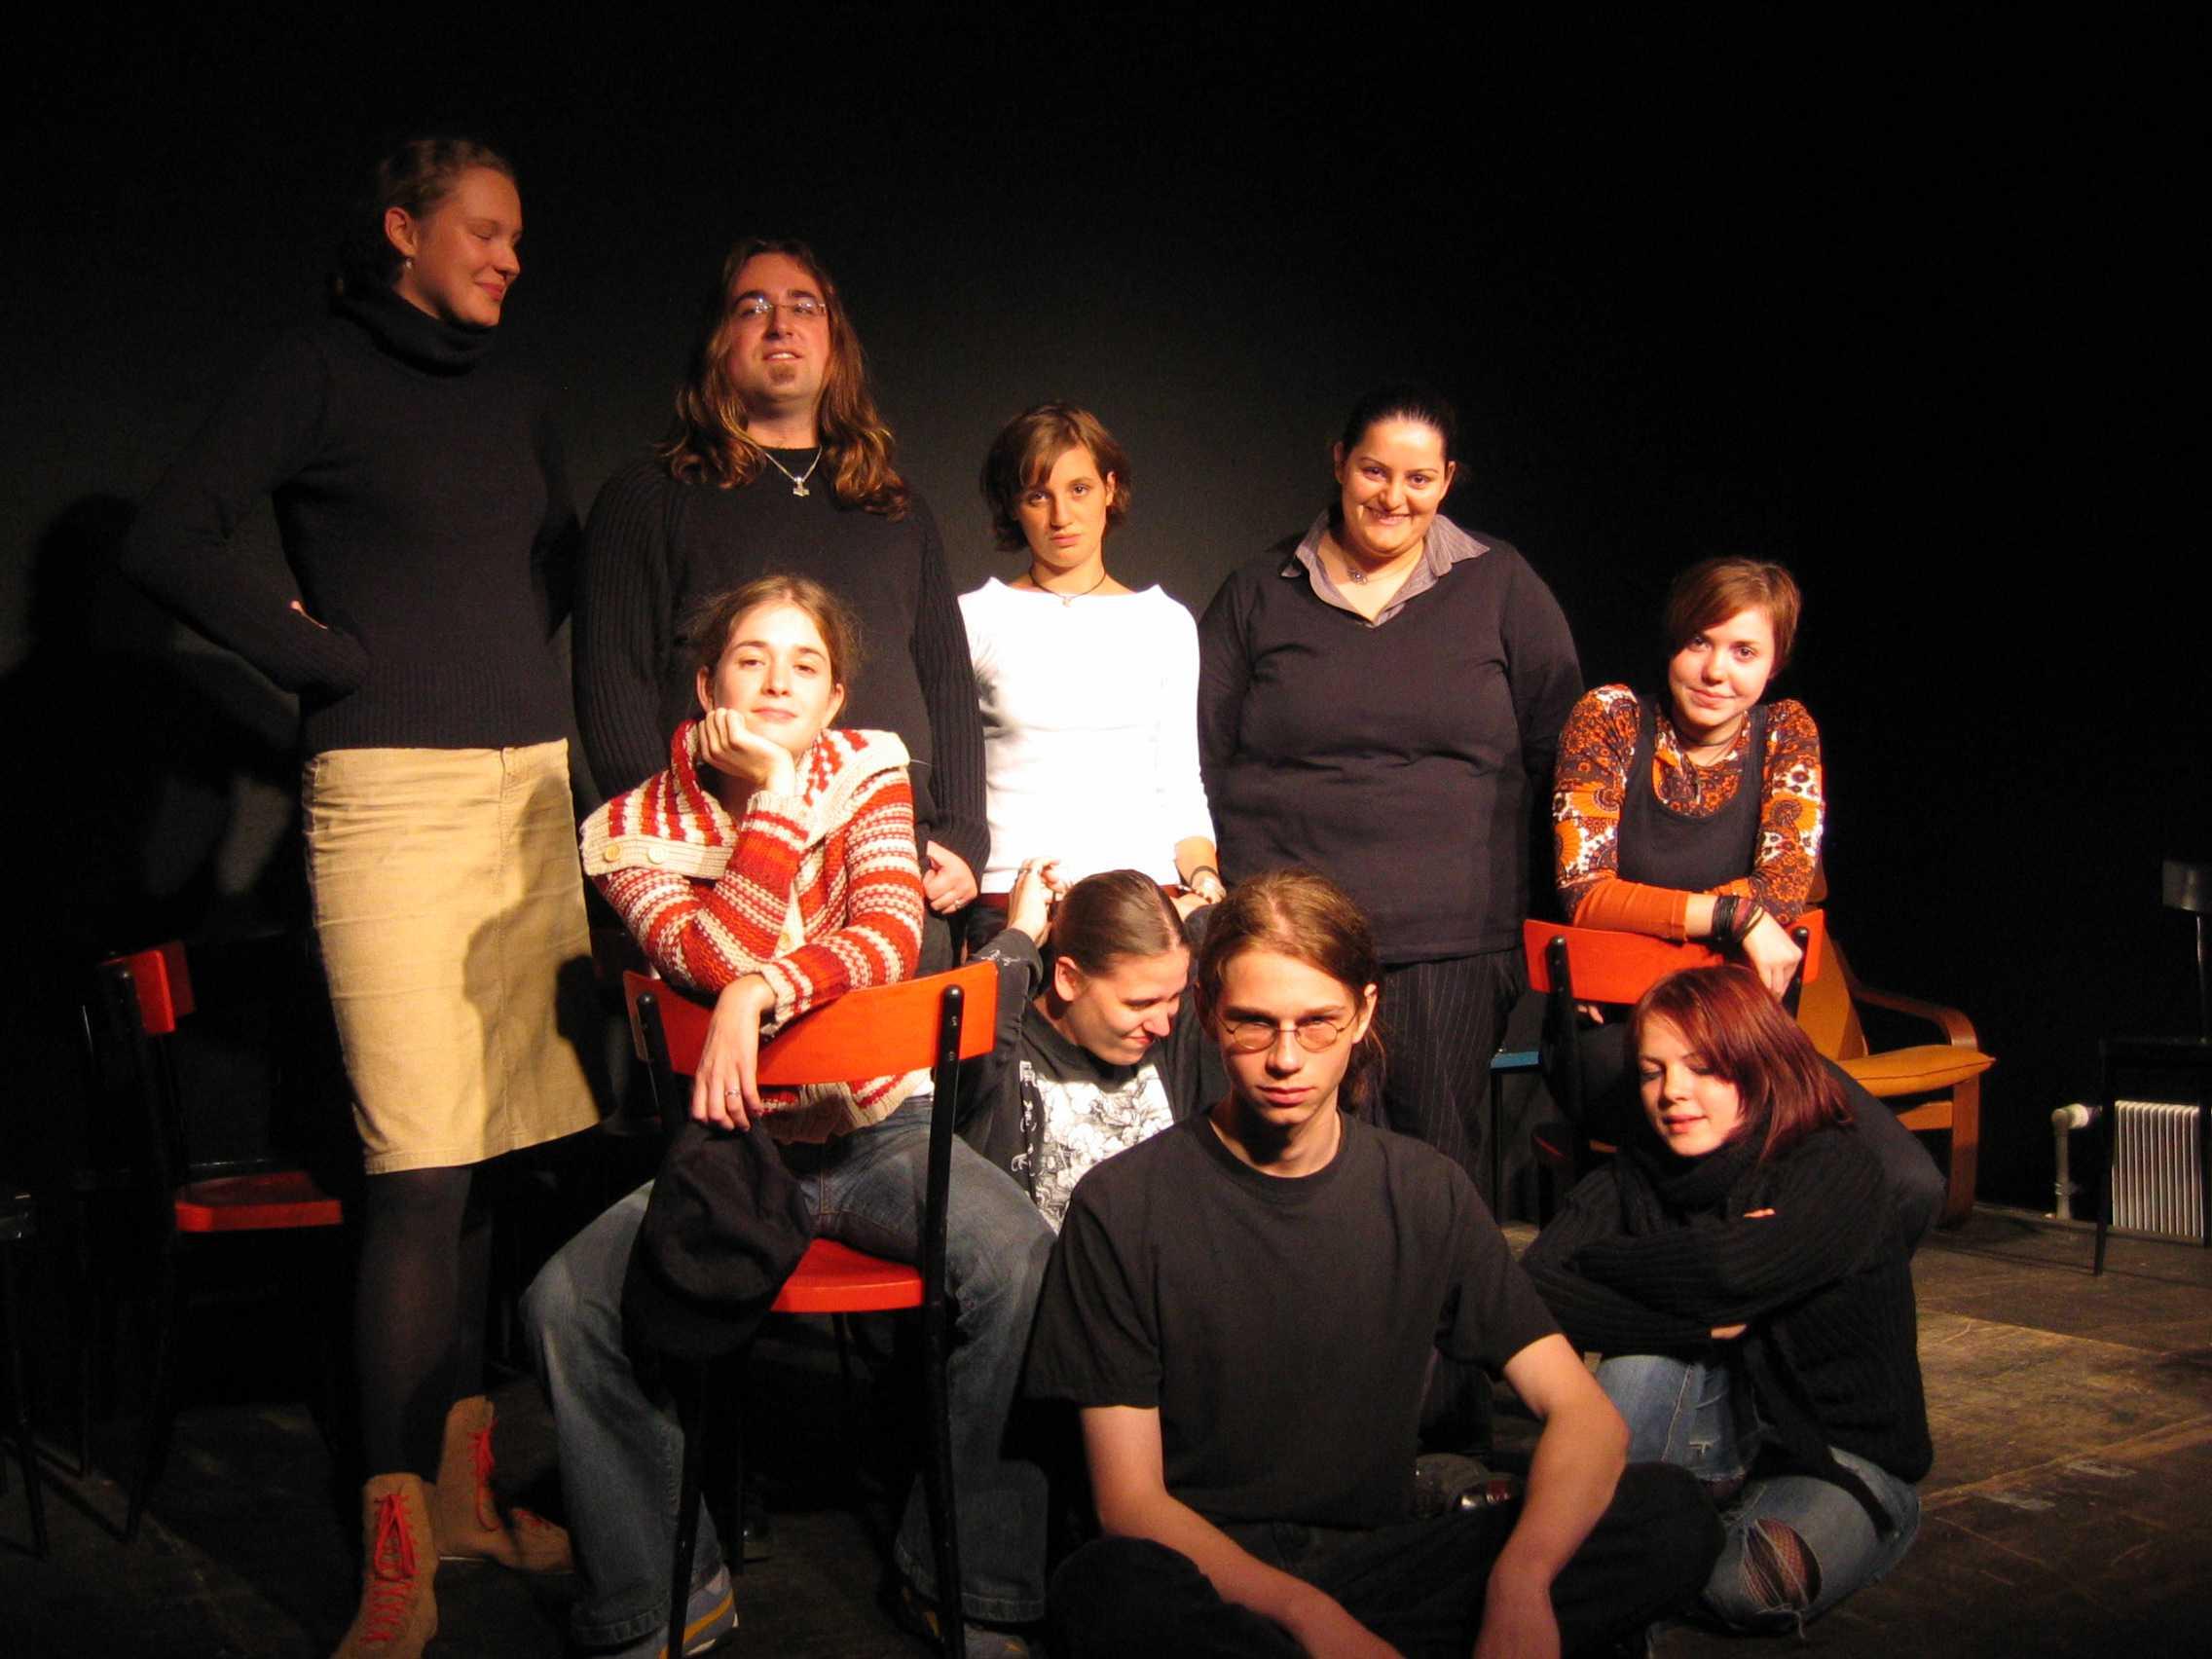 Germania: Tod in Berlin - theaterdreieck würzburg | Theater in würzburg